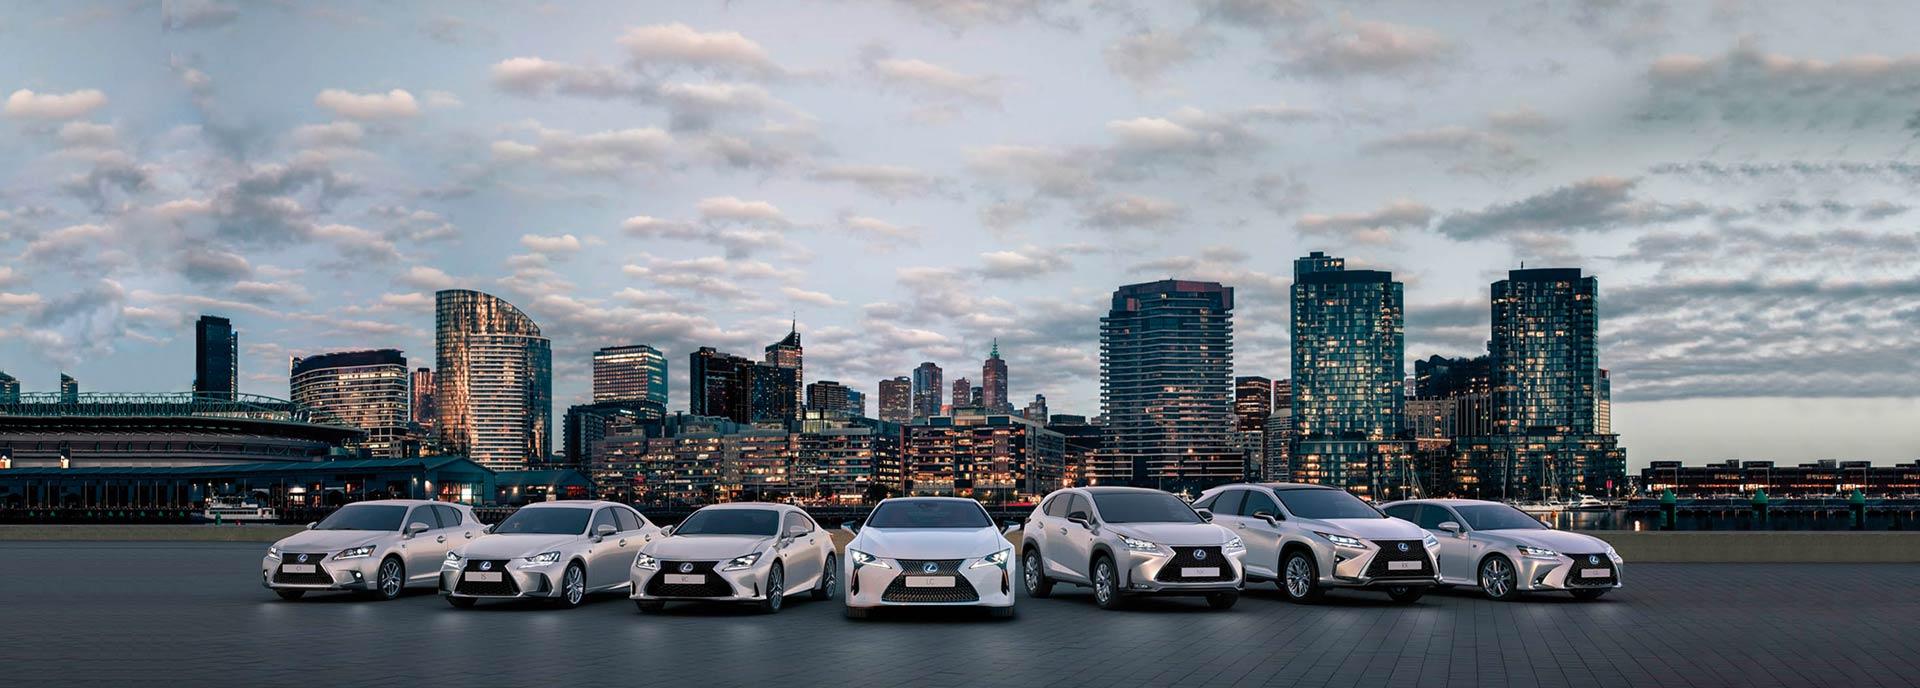 Lexus Gama ciudad